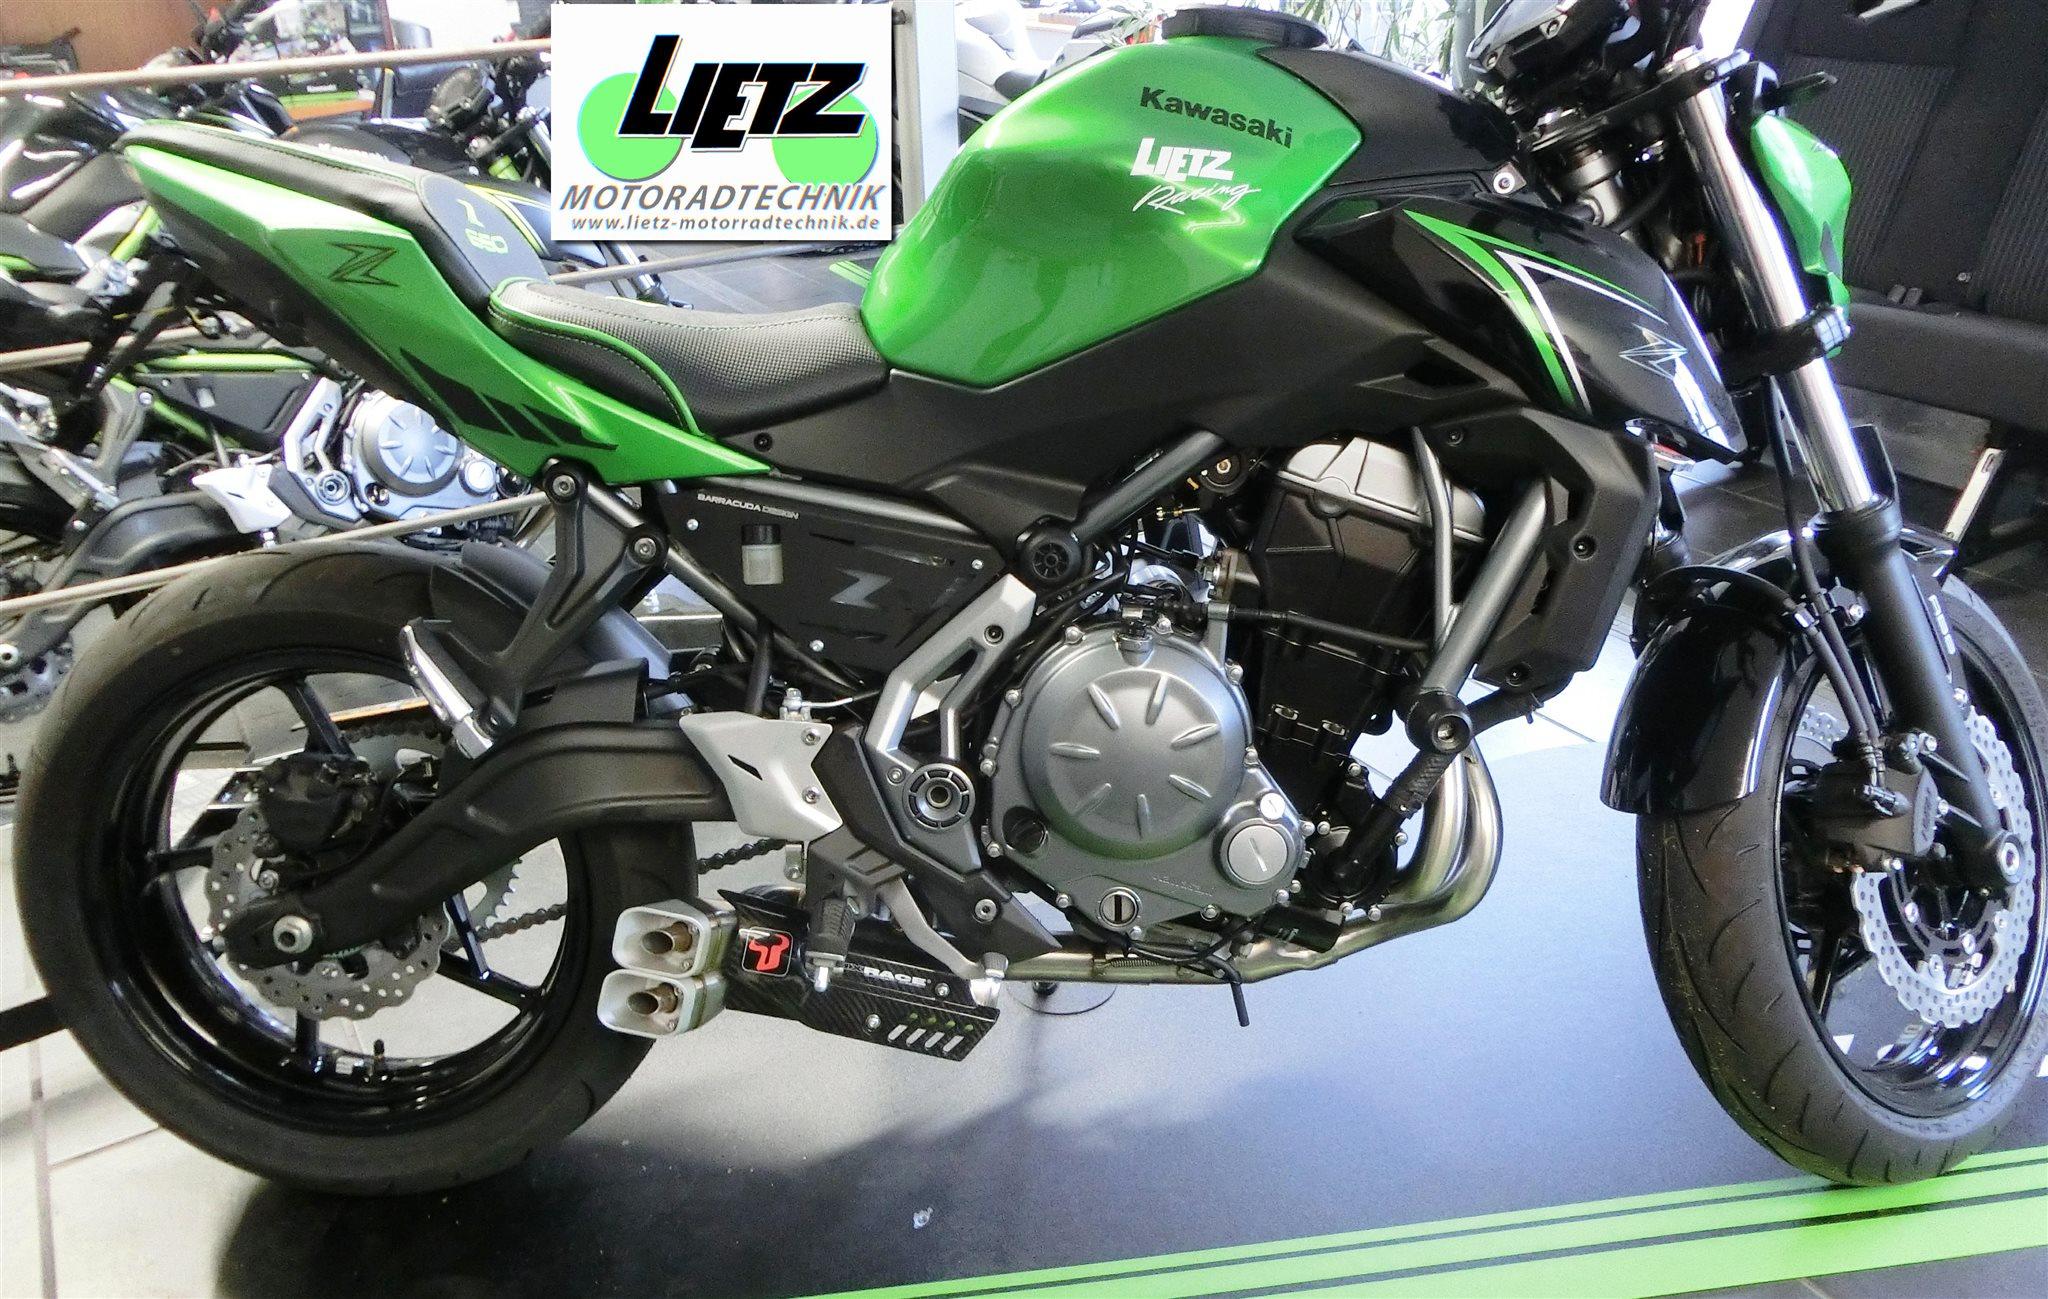 Umgebautes Motorrad Kawasaki Z 650 Von Lietz Motorradtechnik